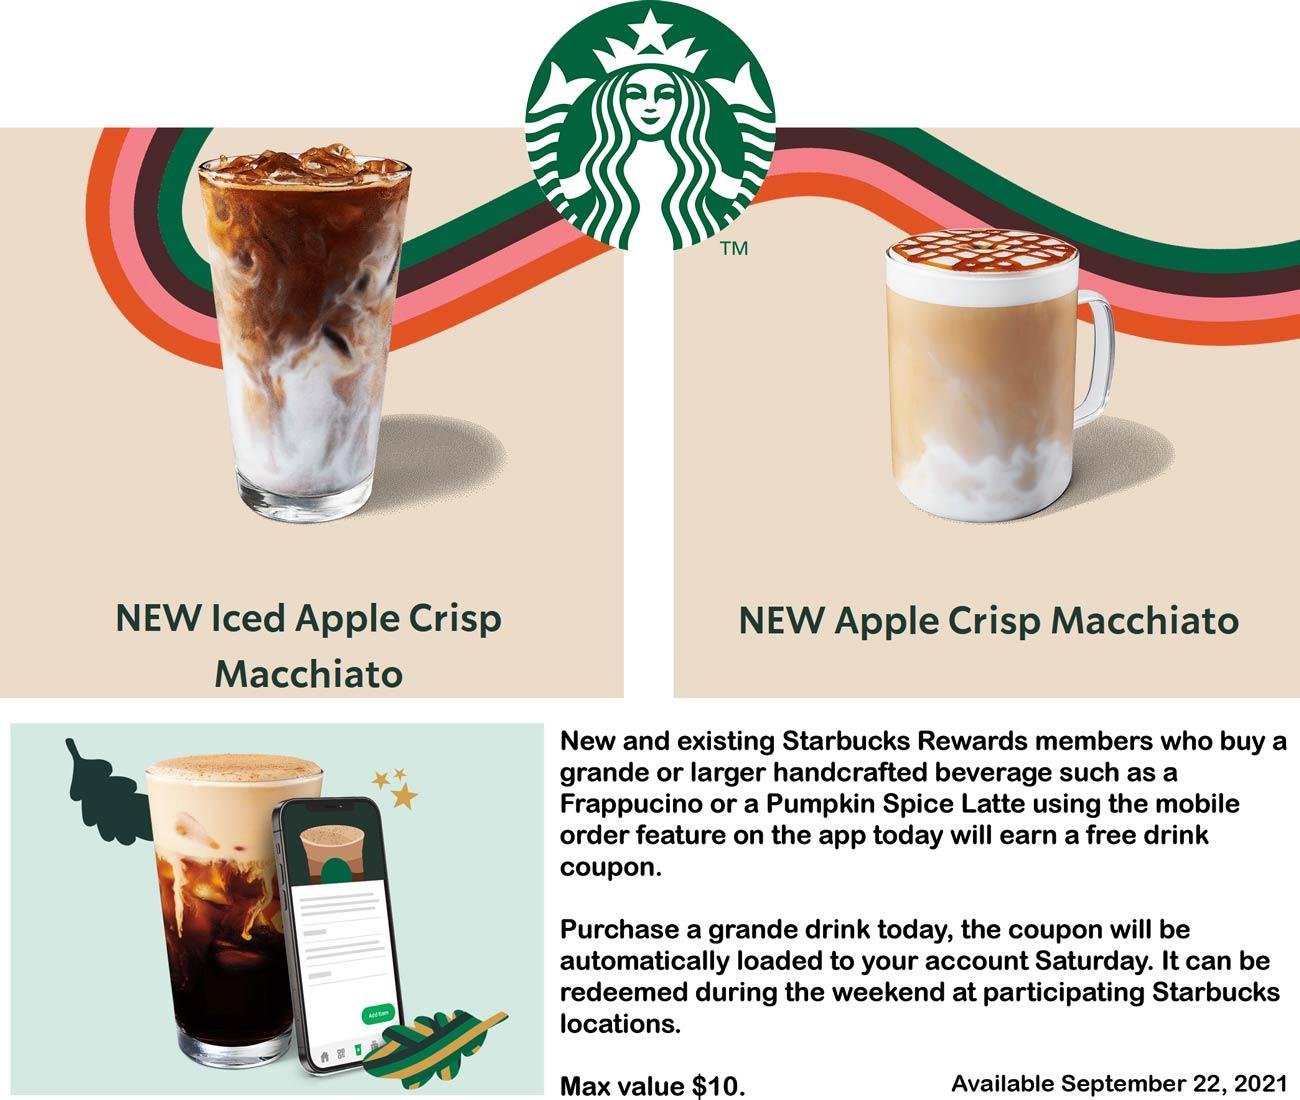 Starbucks restaurants Coupon  Second followup grande coffee free via mobile order today in the Starbucks app #starbucks